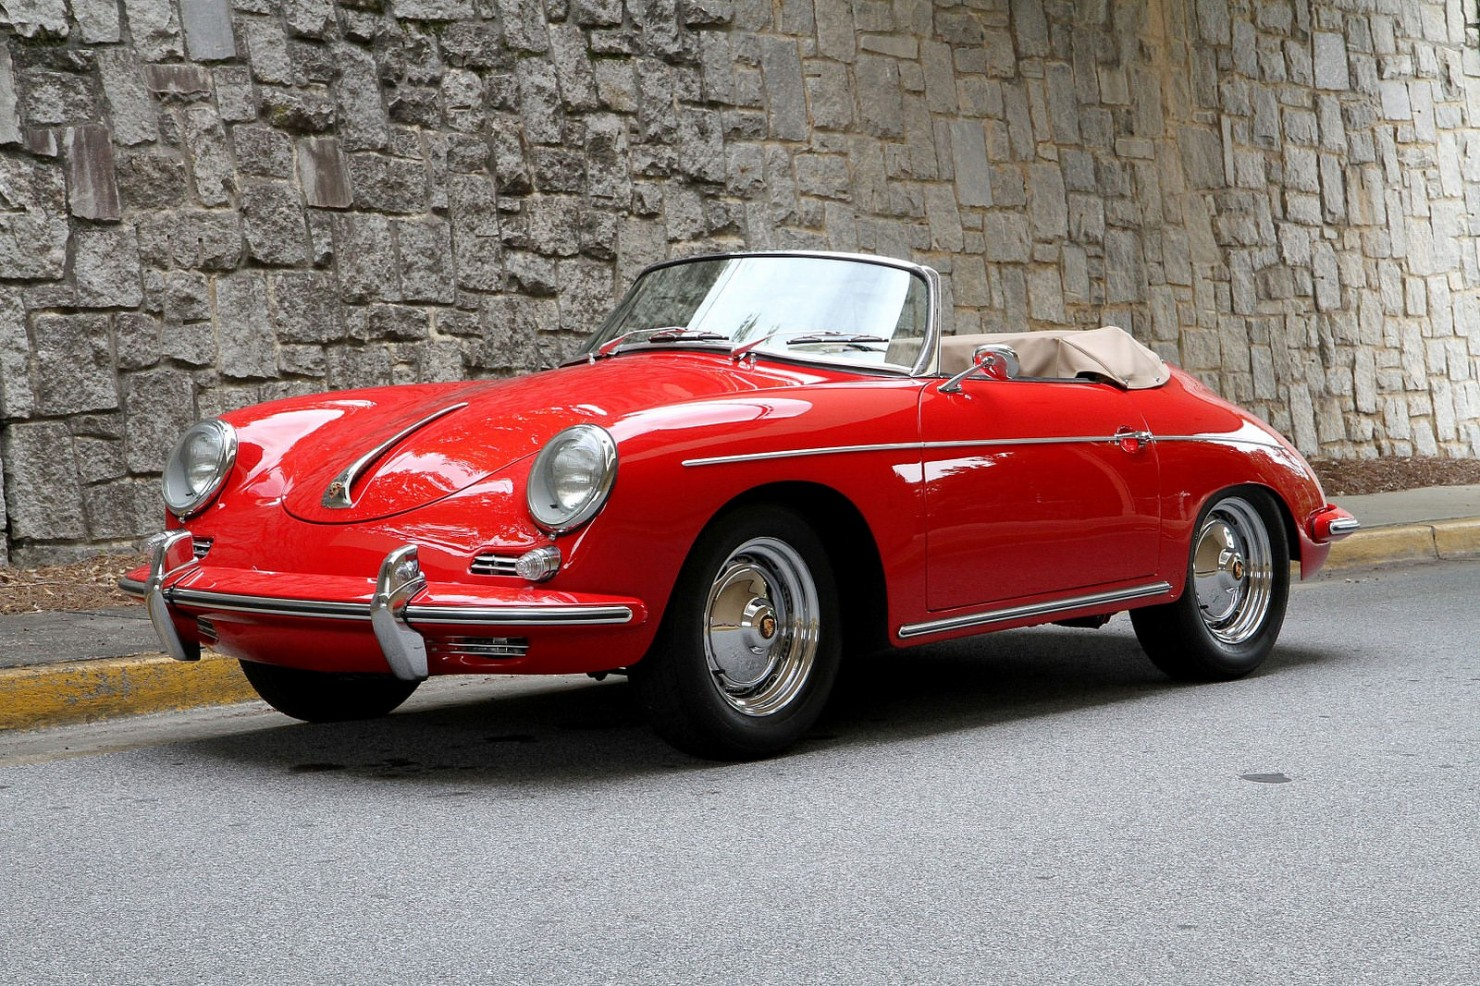 Porsche 356 Roadster Front Side